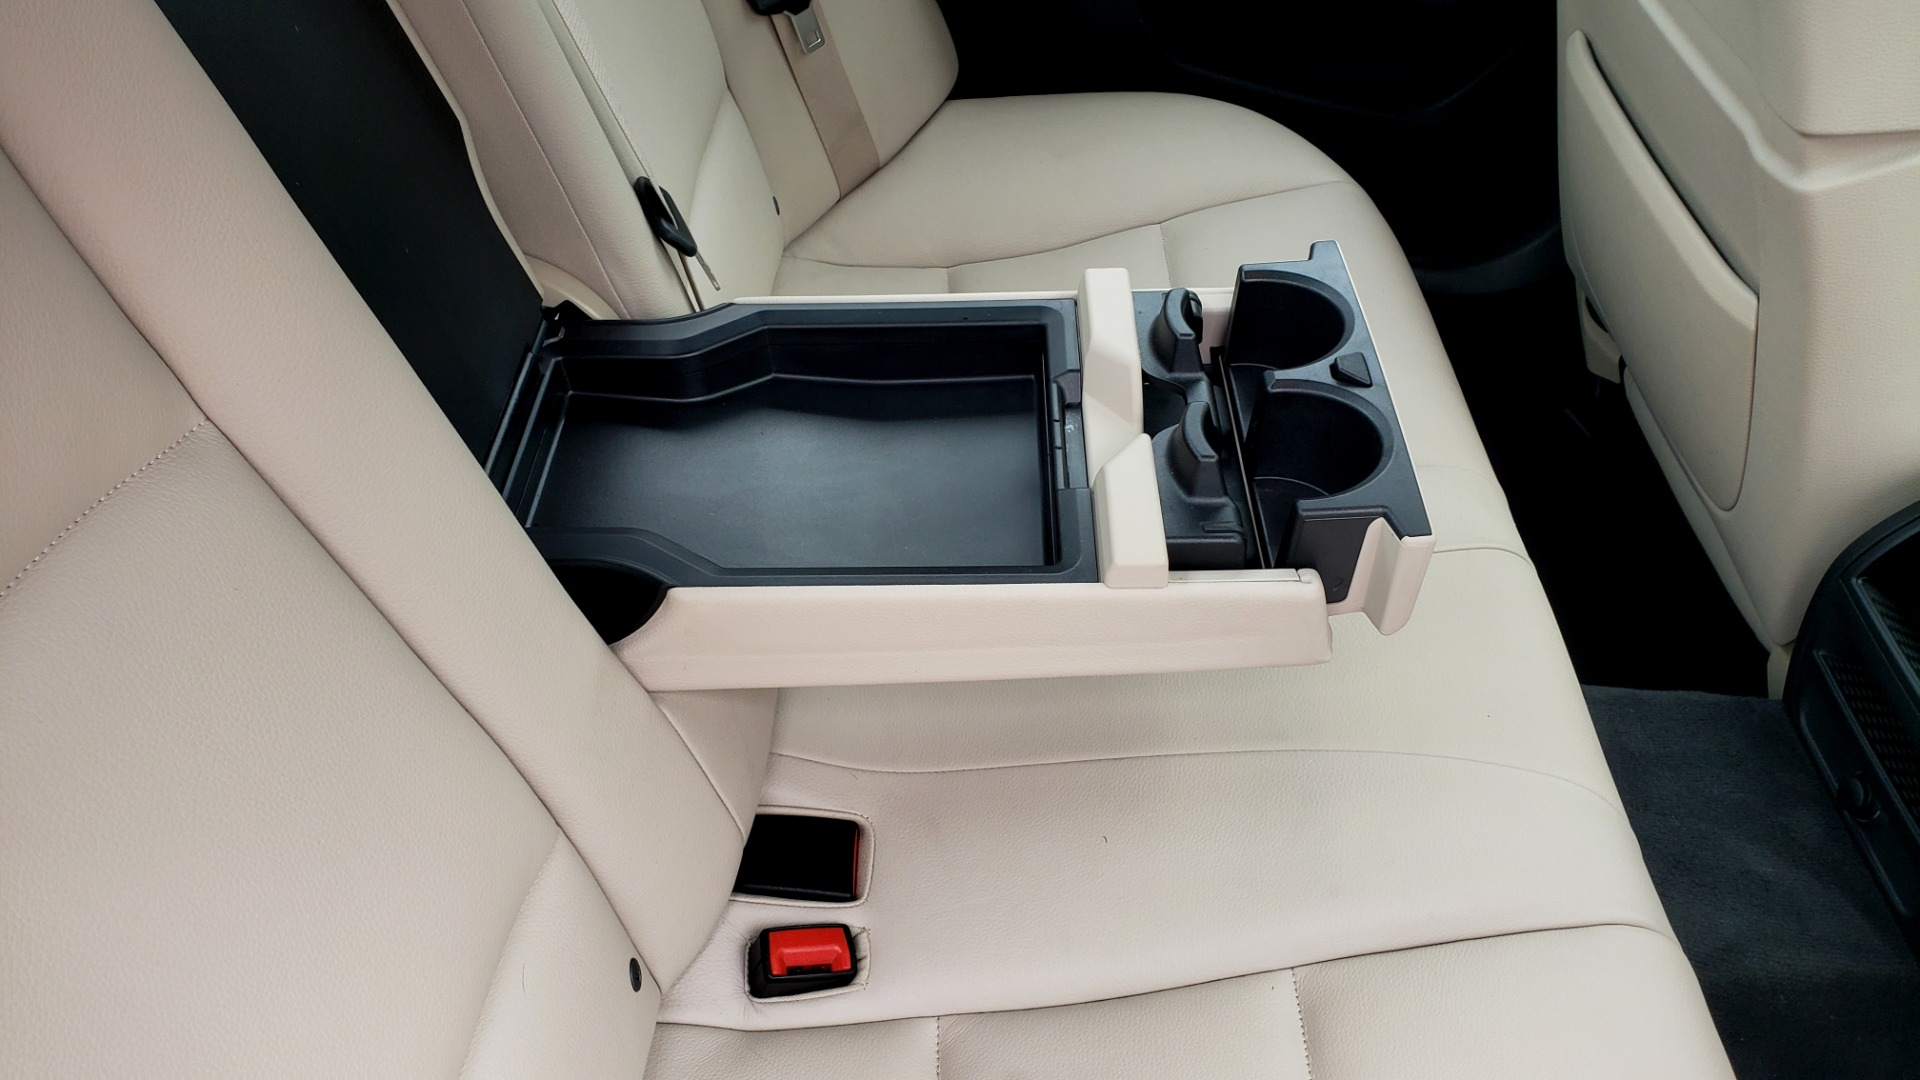 Used 2012 BMW 5 SERIES 550I M SPORT / NAV / CONV PKG / SUNROOF / PREM SND / REARVIEW for sale Sold at Formula Imports in Charlotte NC 28227 65